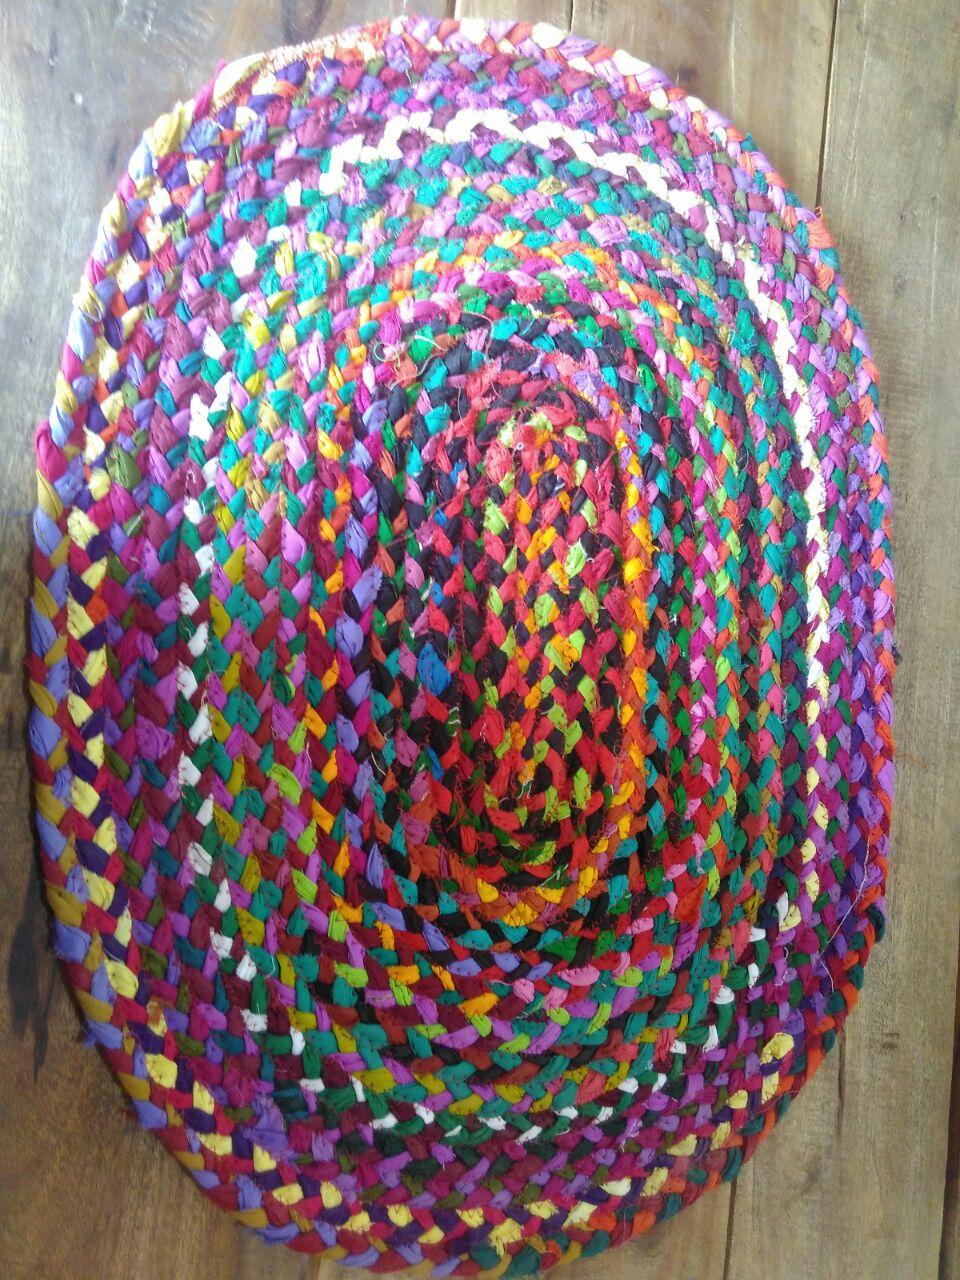 Braided rugs